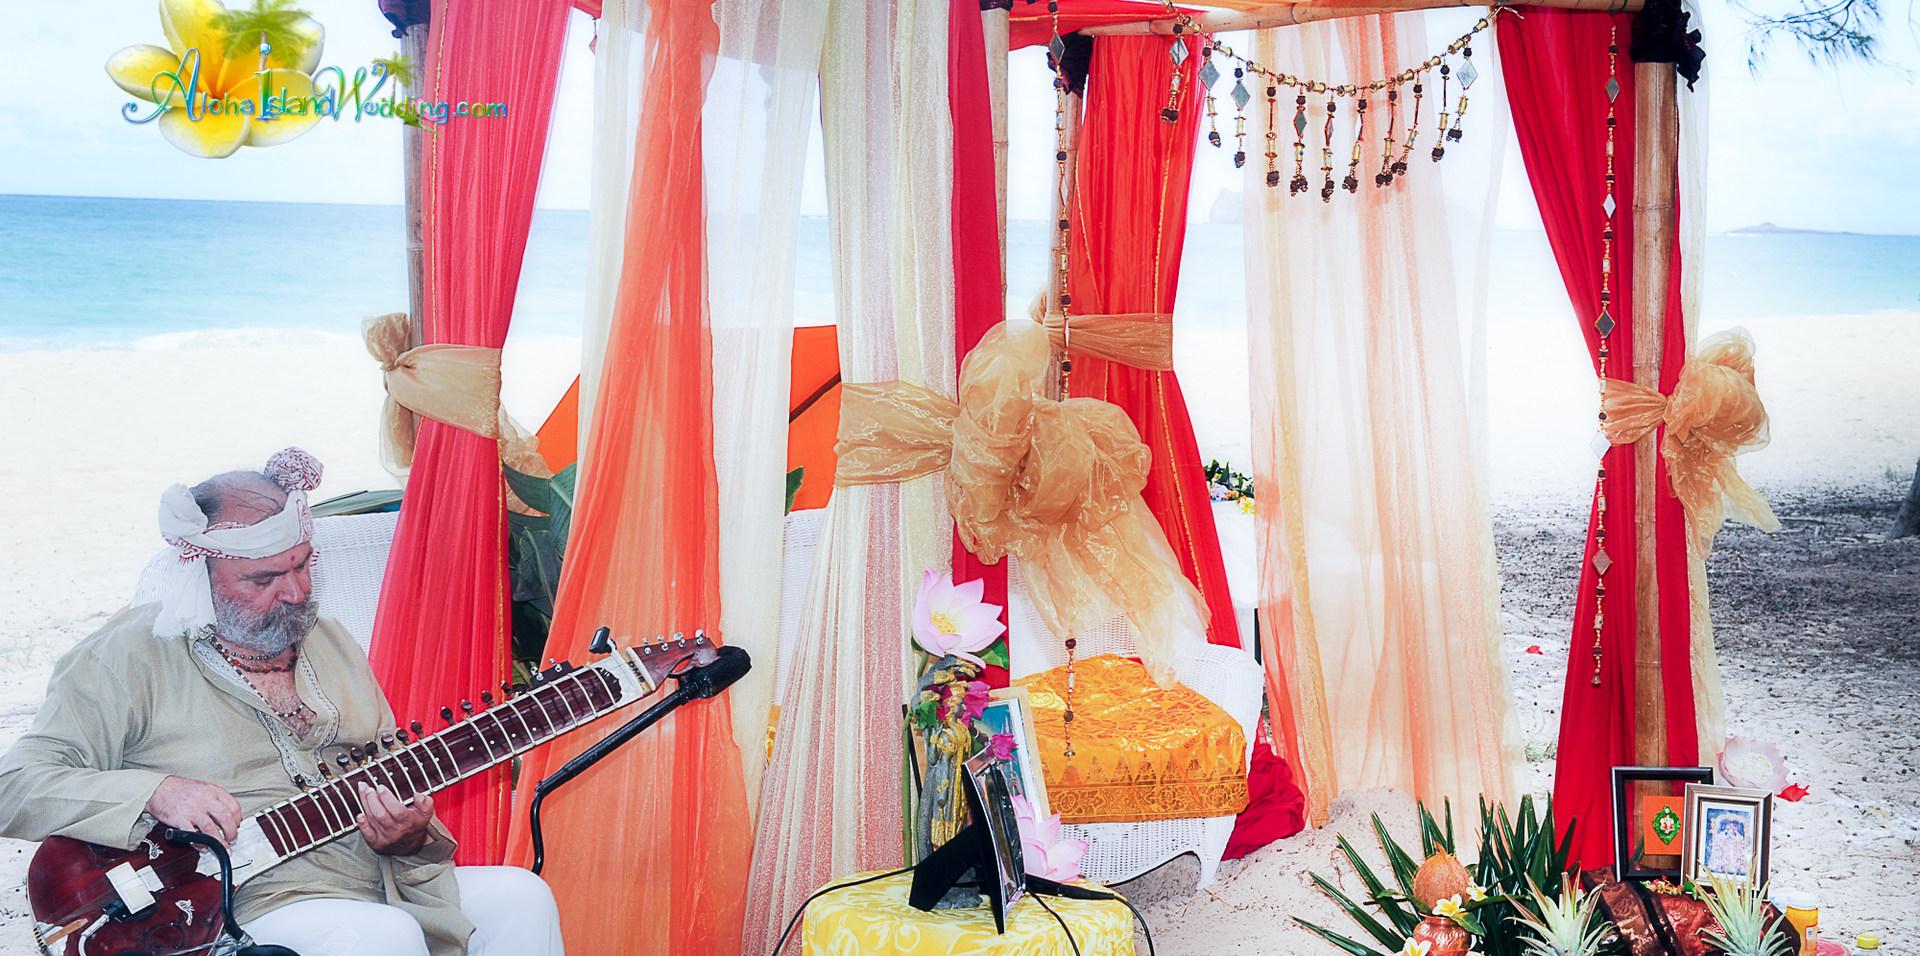 Indian wedding ceremony in hawaii-34.jpg